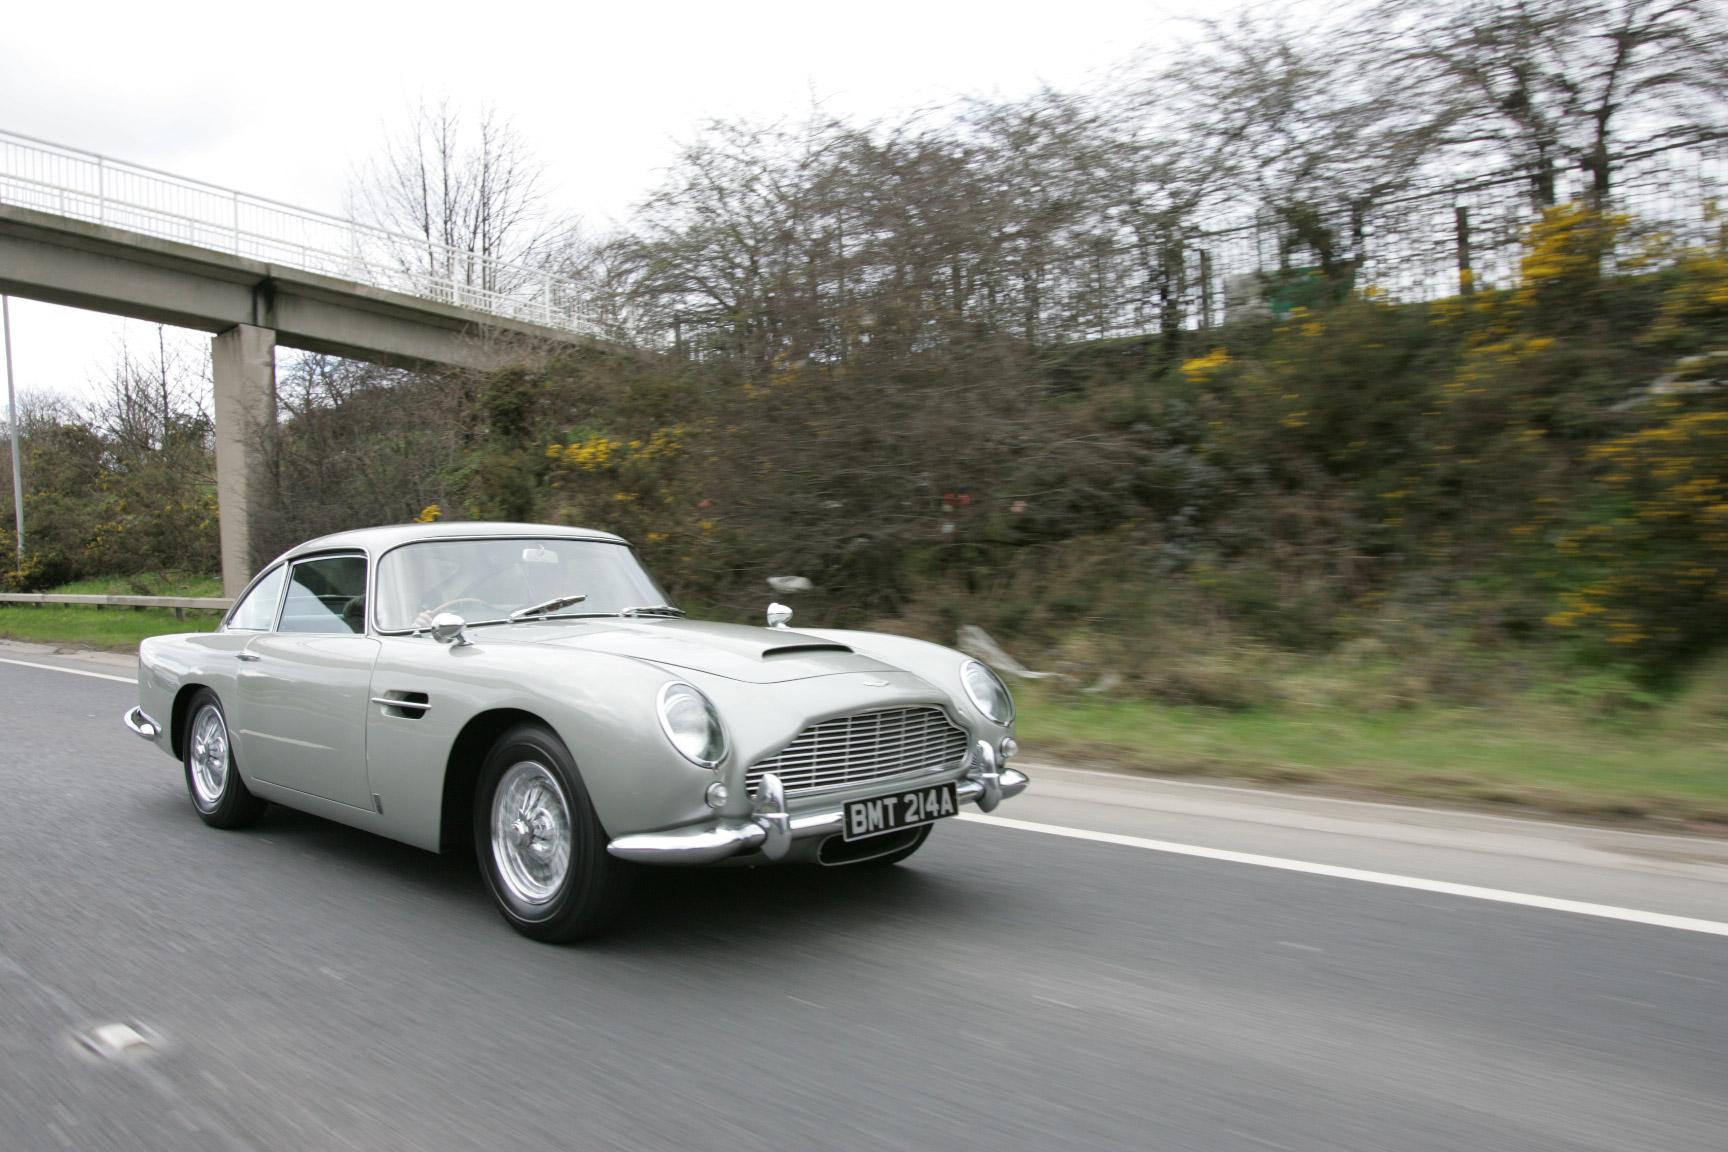 1965 Aston Martin DB5 Rolling Highway 3/4